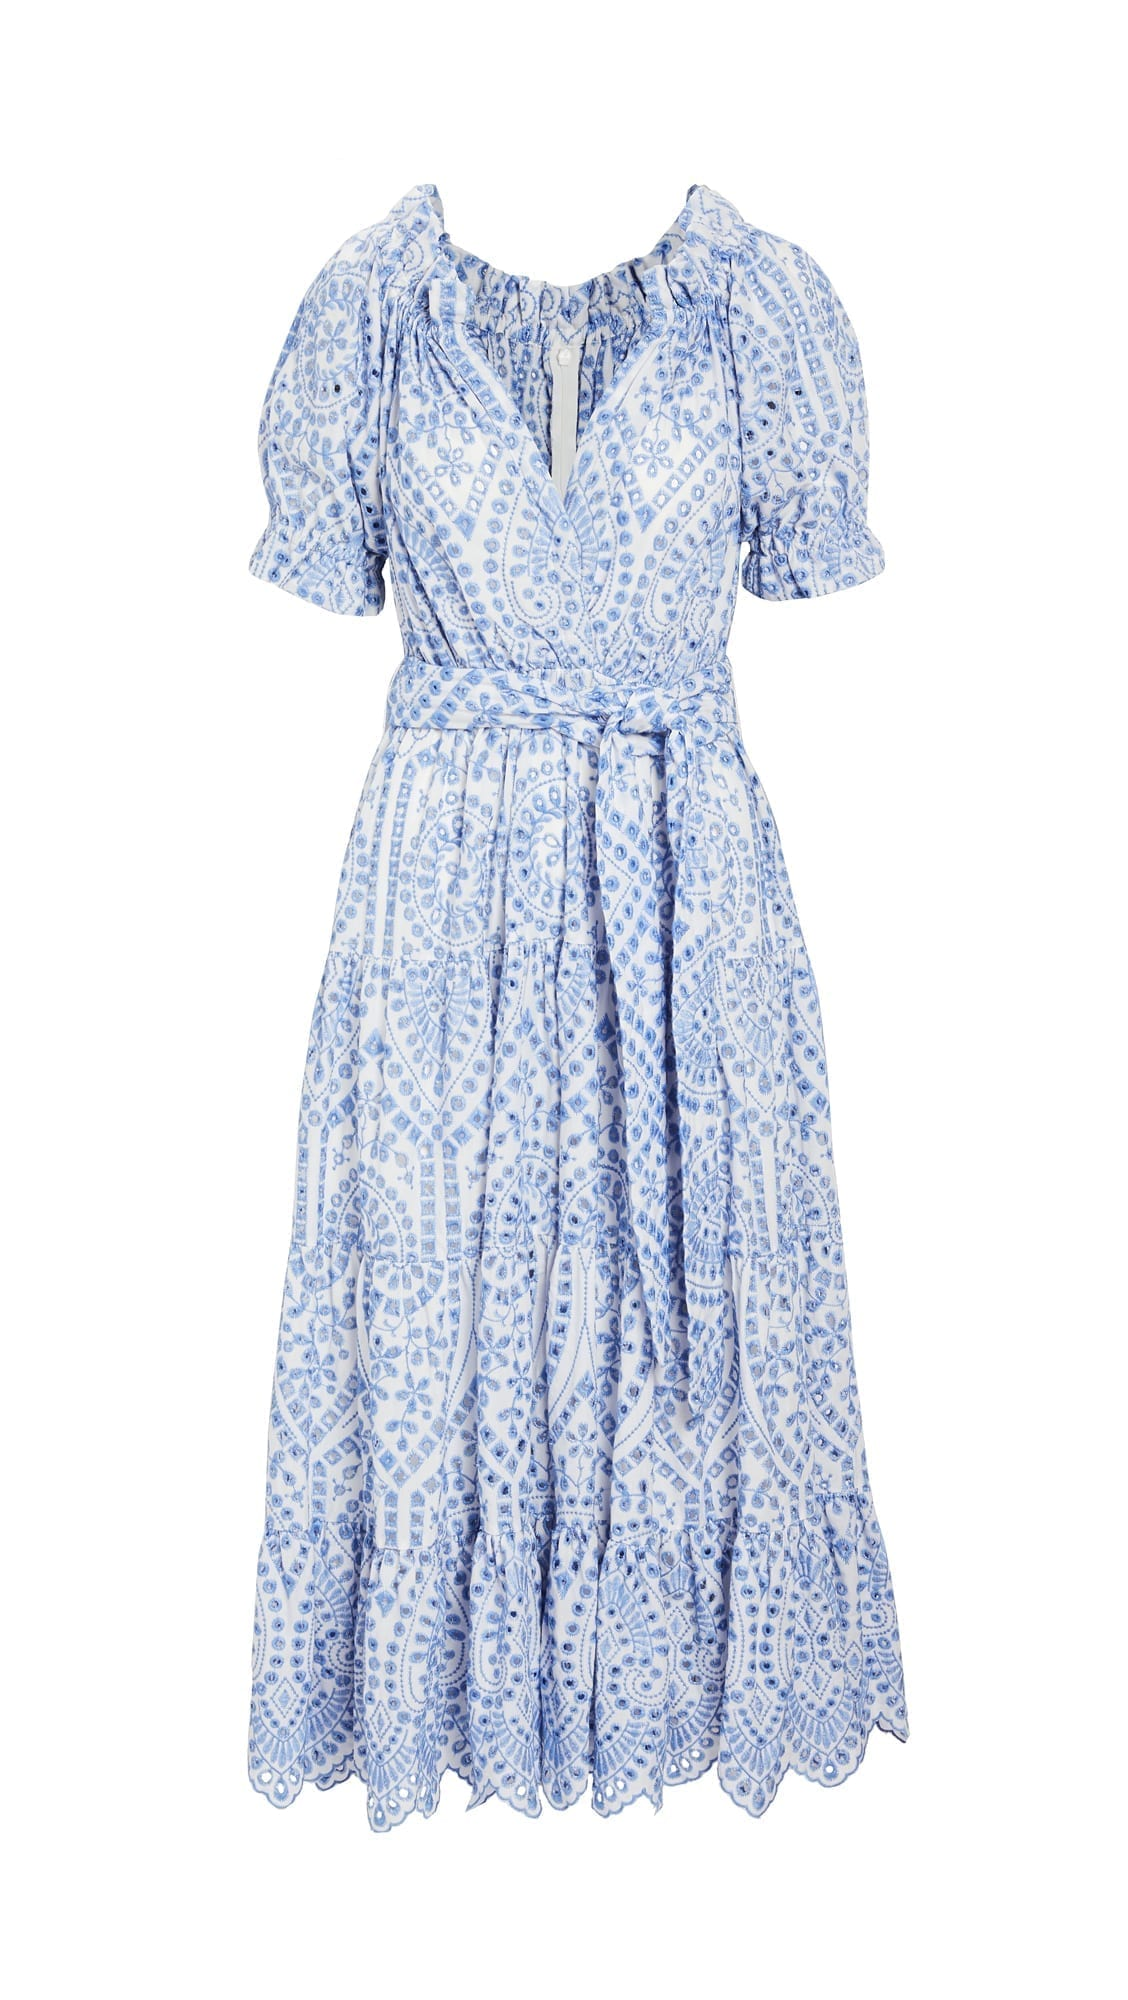 CHARINA SARTE Raya Maxi Dress